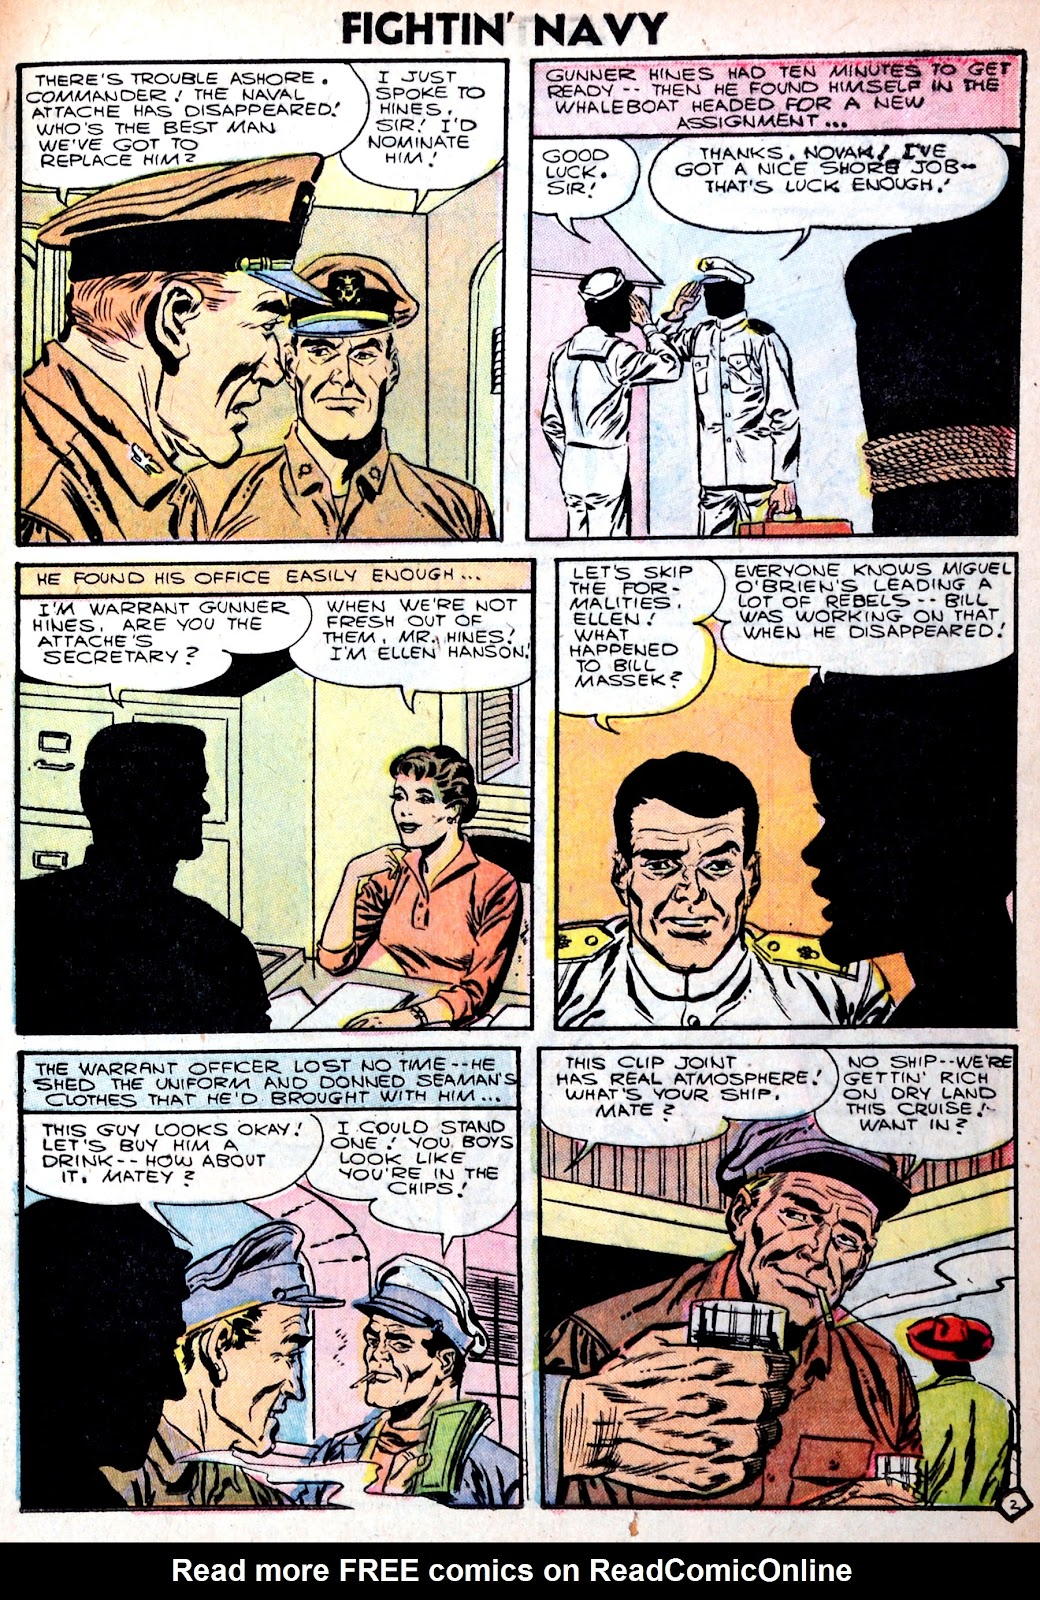 Read online Fightin' Navy comic -  Issue #75 - 25